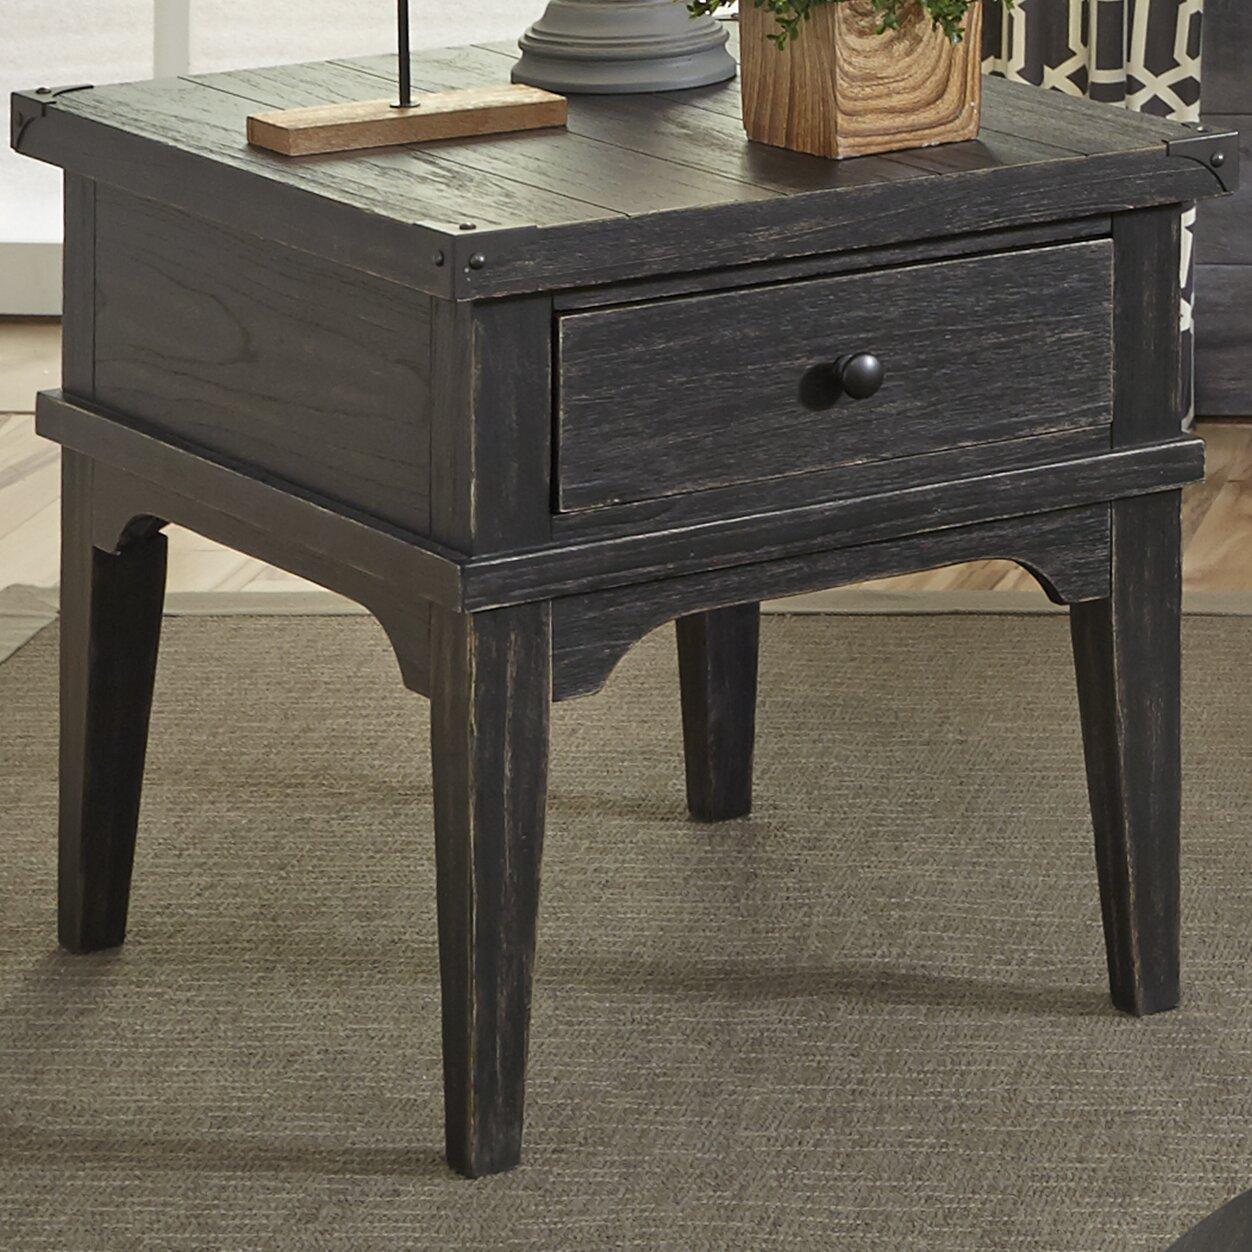 Lark manor paras arm chair amp reviews wayfair ca - Cristal End Table